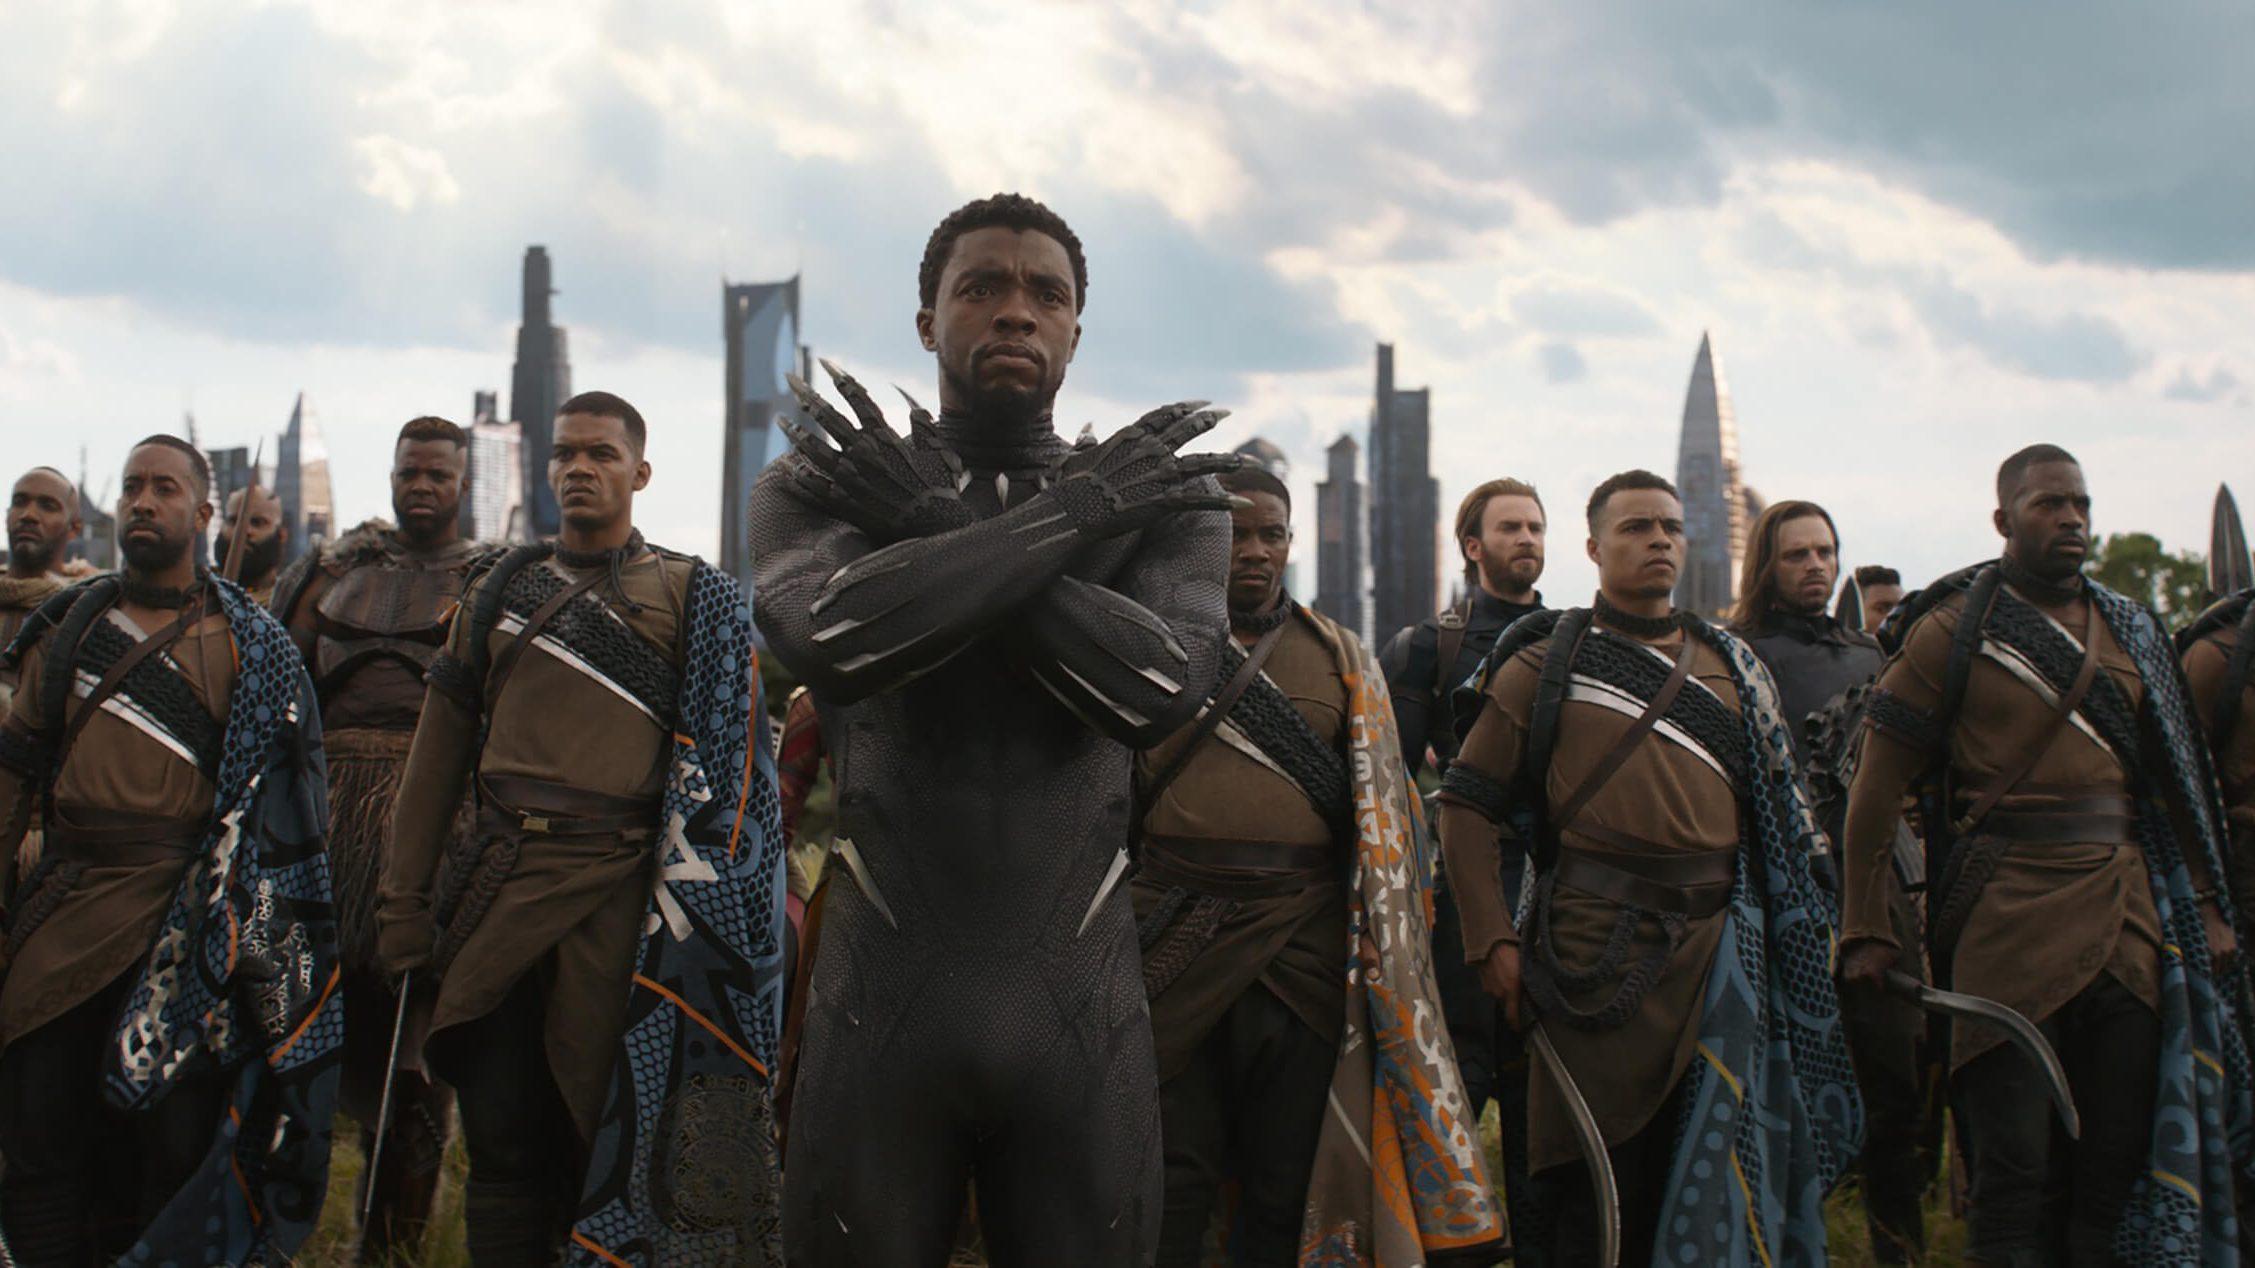 تاریخ اکران فیلم Black Panther 2 اعلام شد.